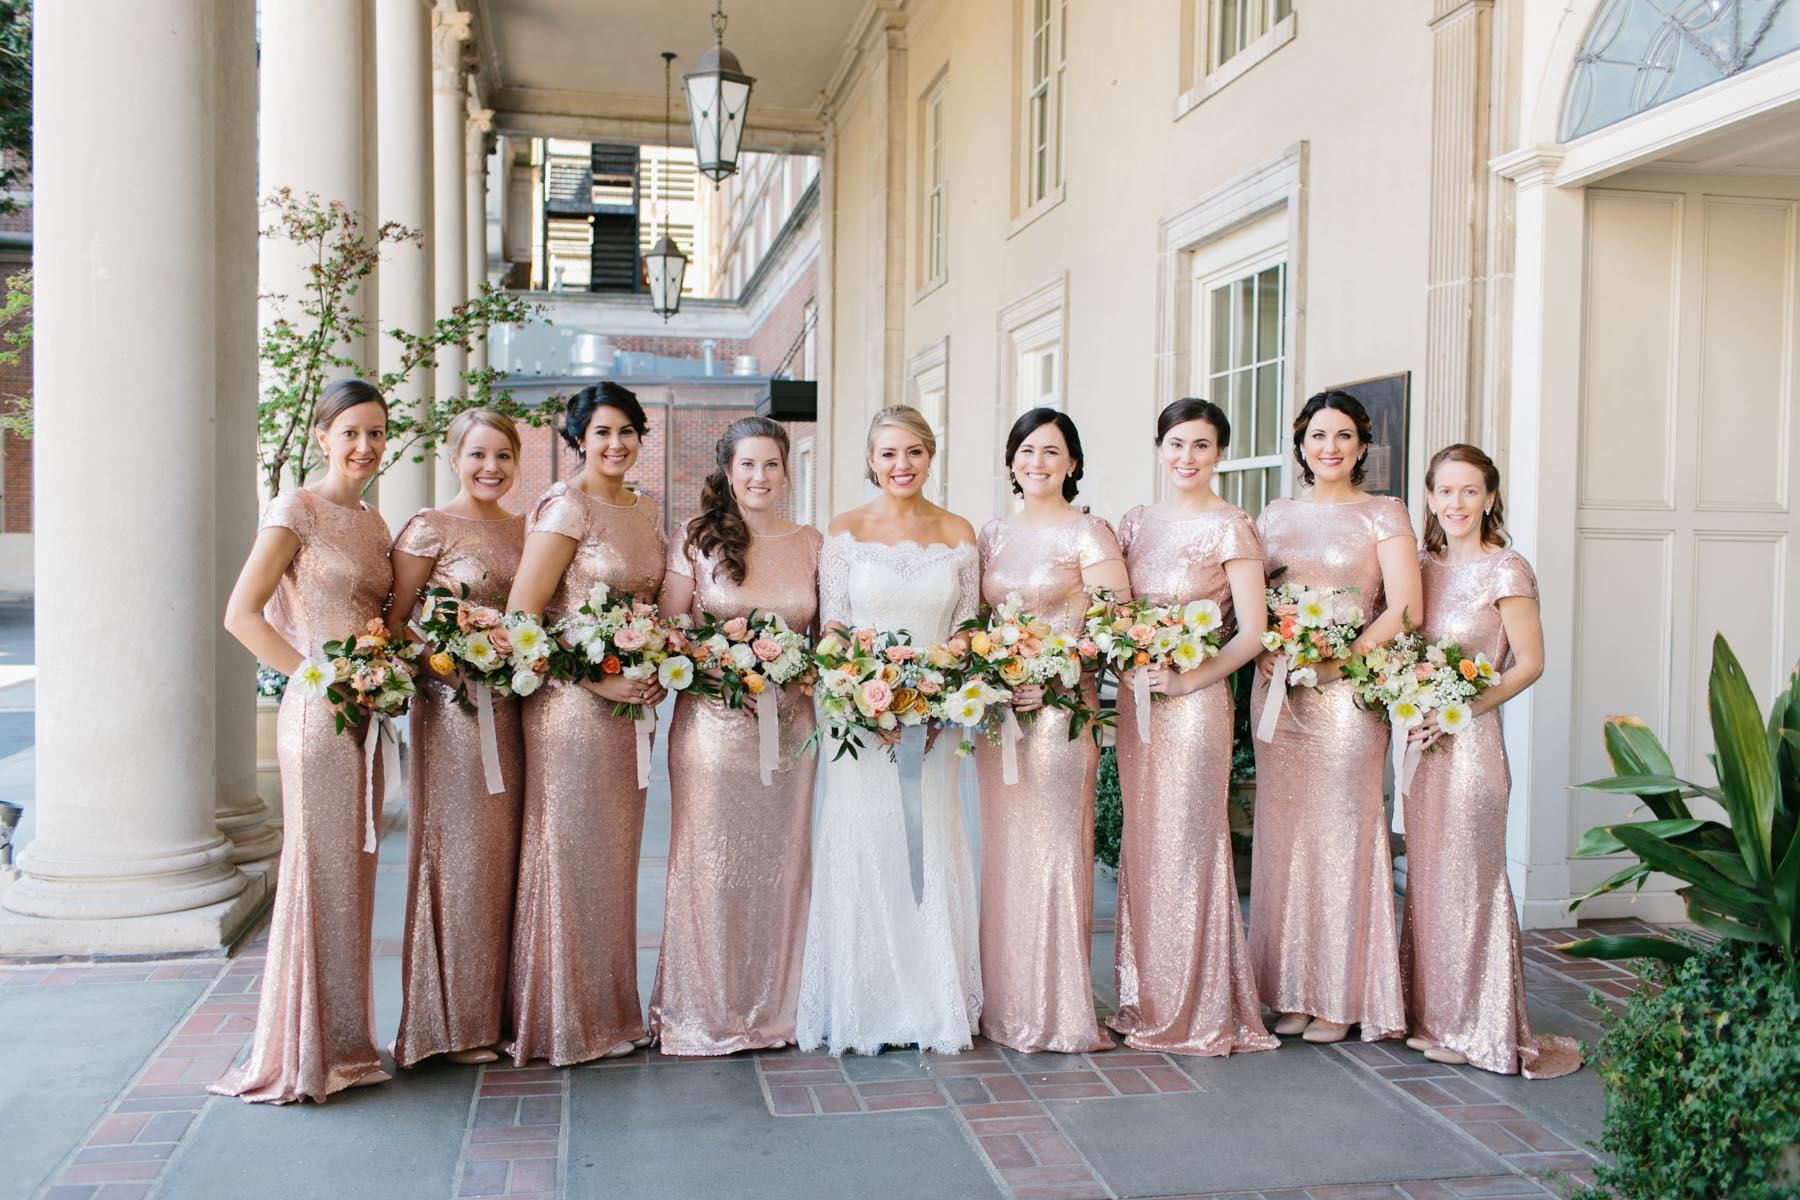 kjellman wedding blog biltmore wedding -50